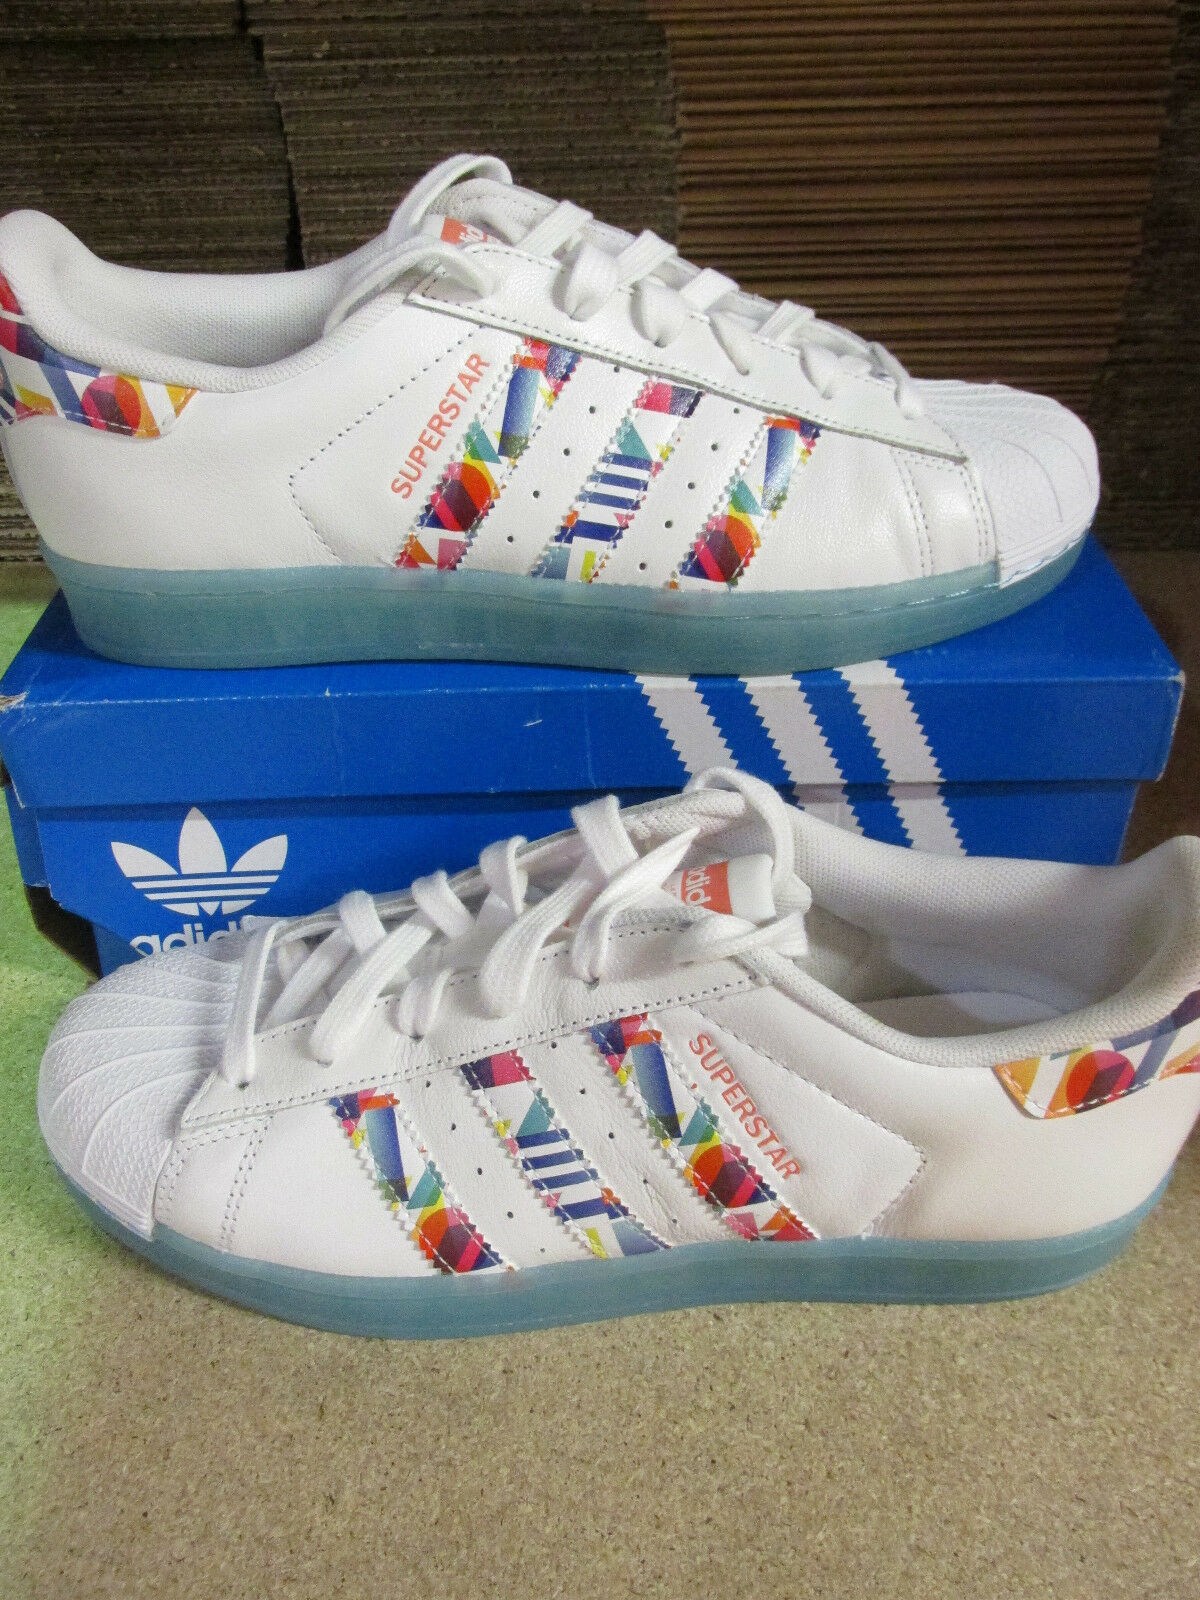 Zapatos promocionales para hombres y mujeres adidas originals superstar BB4308 womens trainers sneakers shoes